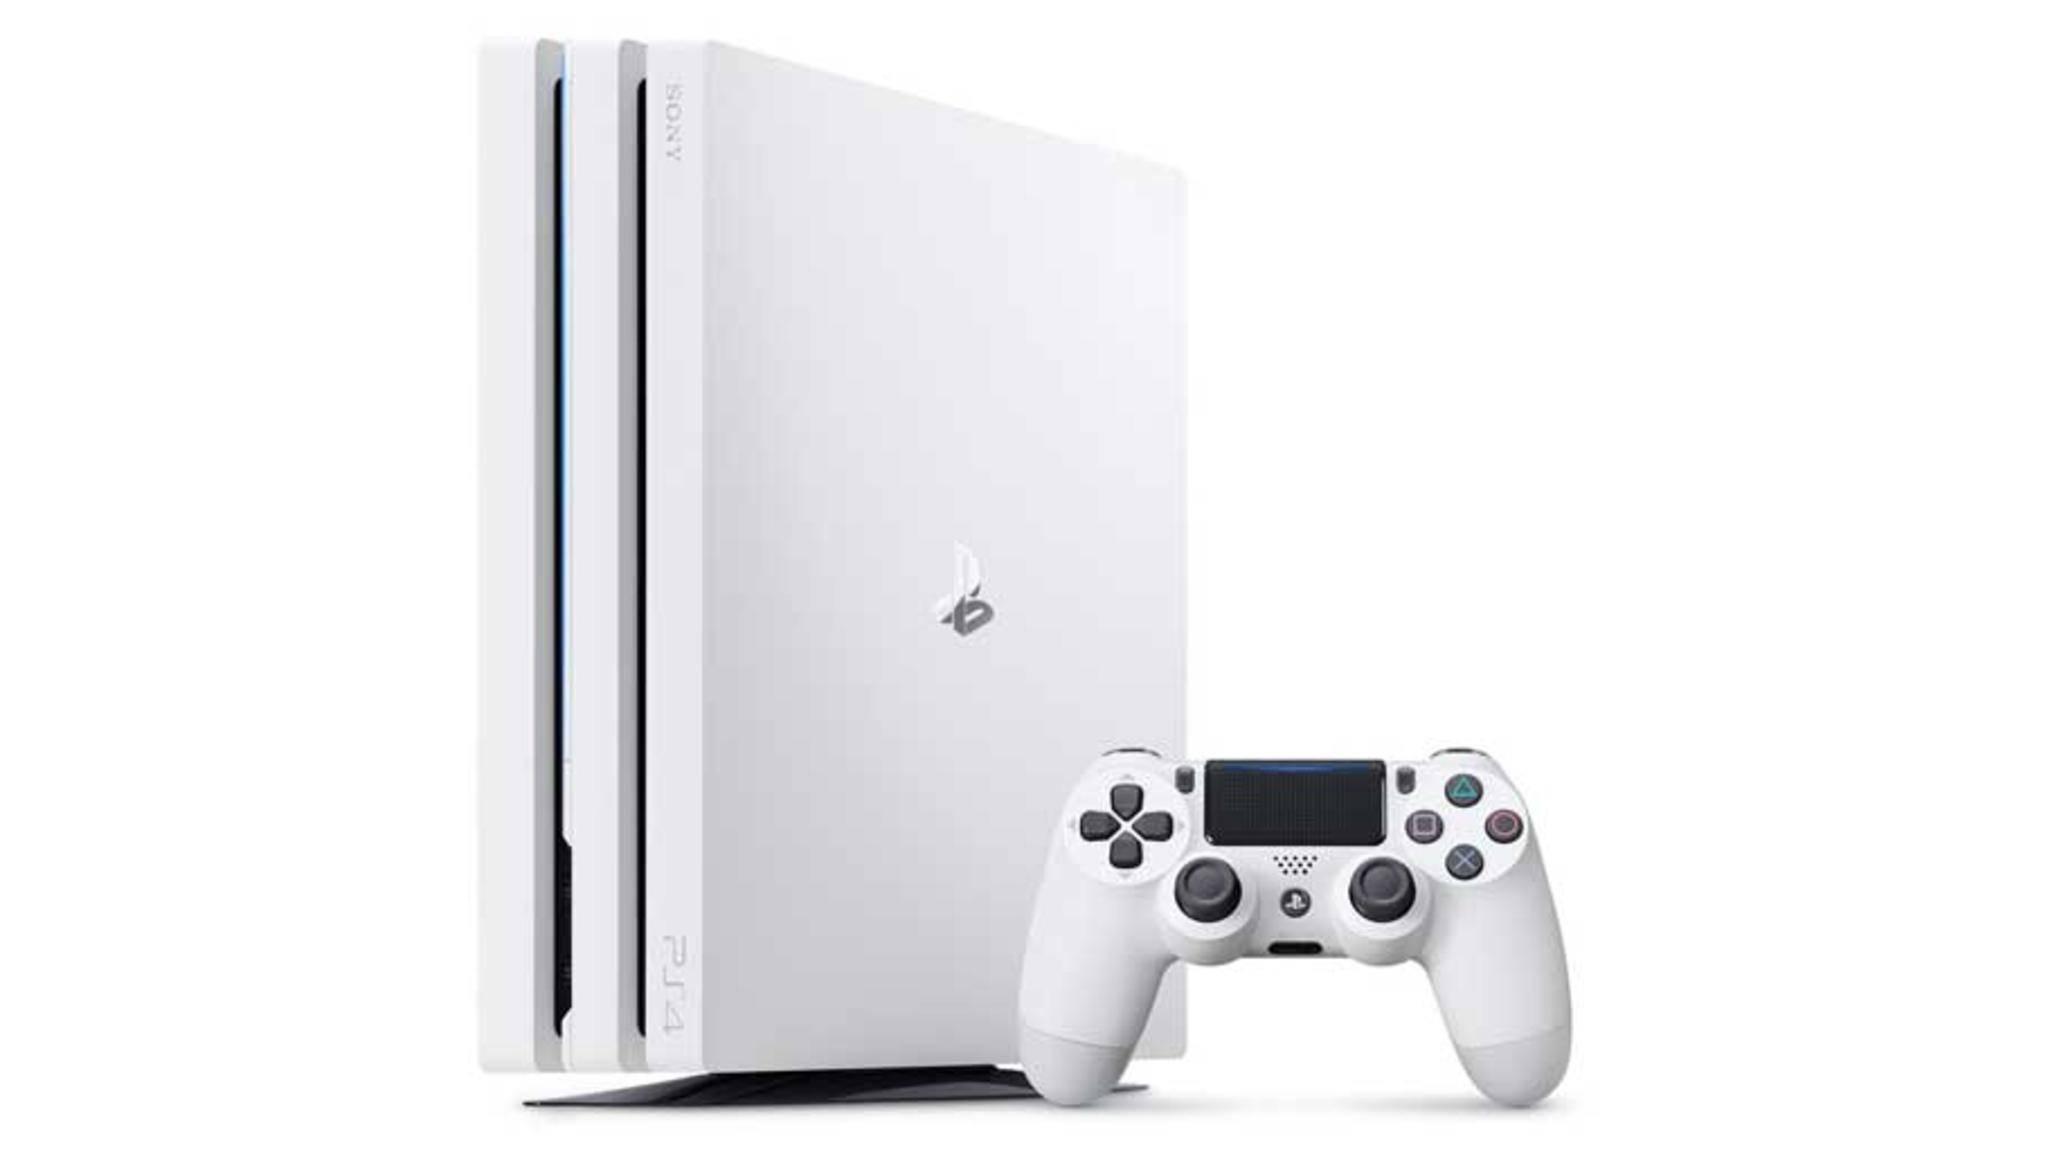 Sony kündigt Weiße Playstation 4 Pro im Bundle an